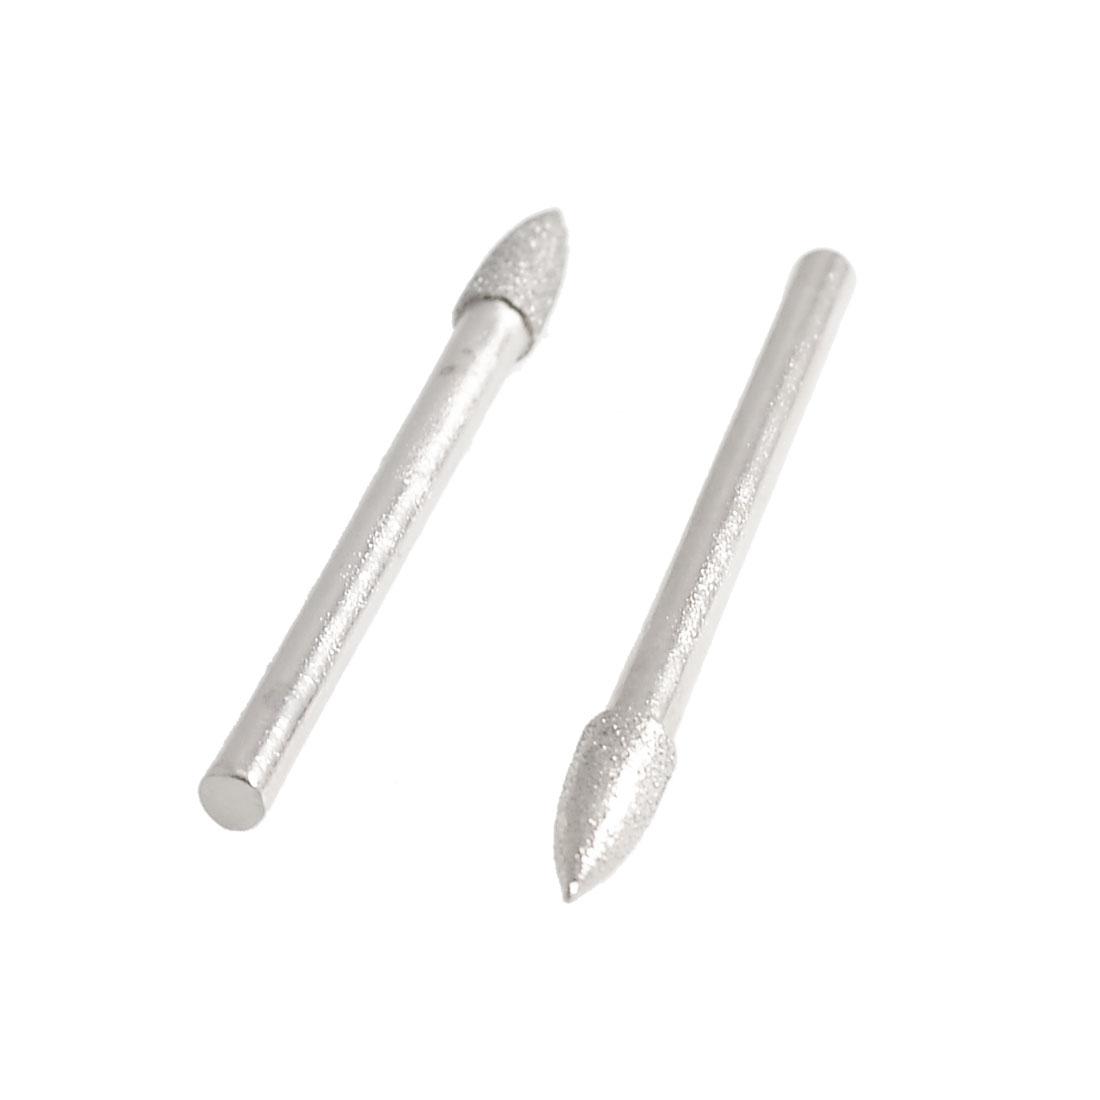 3mm x 4mm Cone Head Diamond File Mounted Point Buffing Bits 2 Pcs